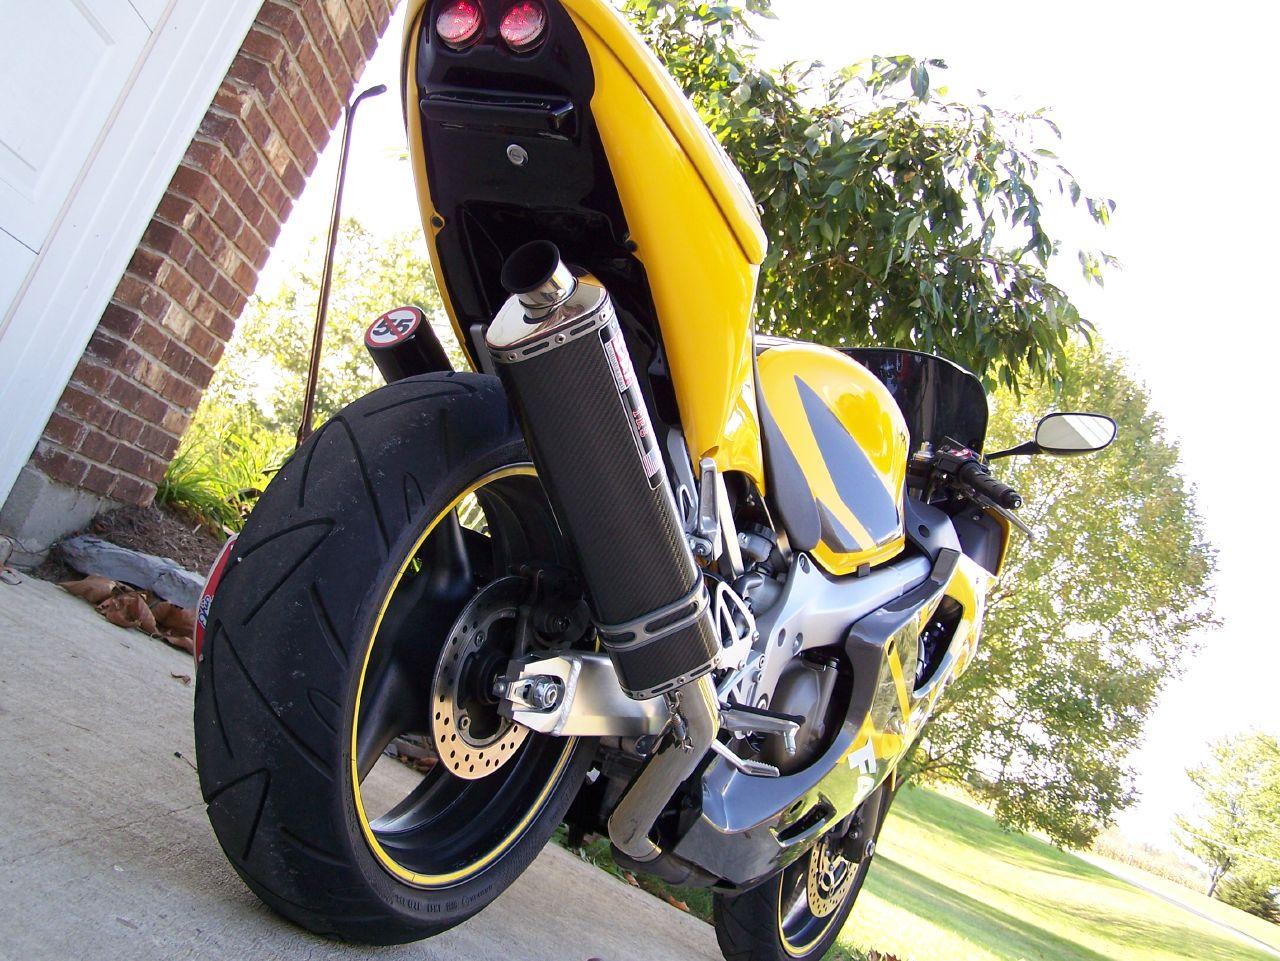 Pics of my bike 1492216990_911bd6c9db_o